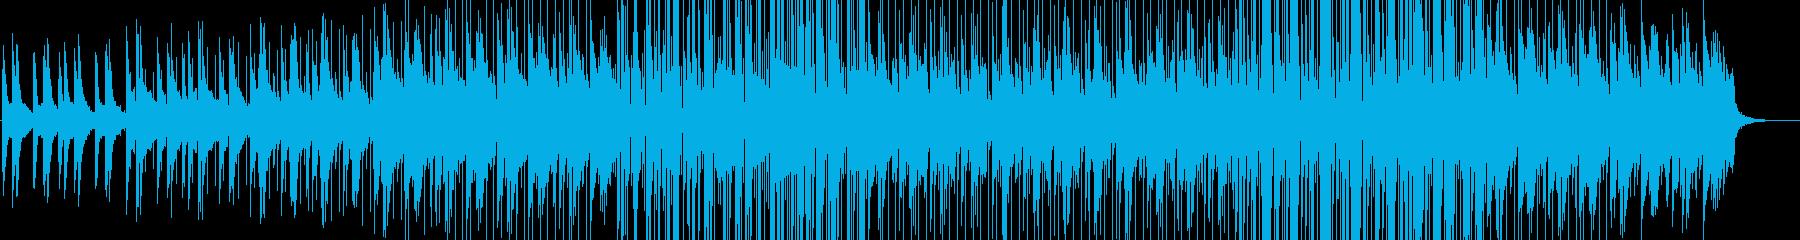 PV-フューチャーPOP-エモ-ドローンの再生済みの波形